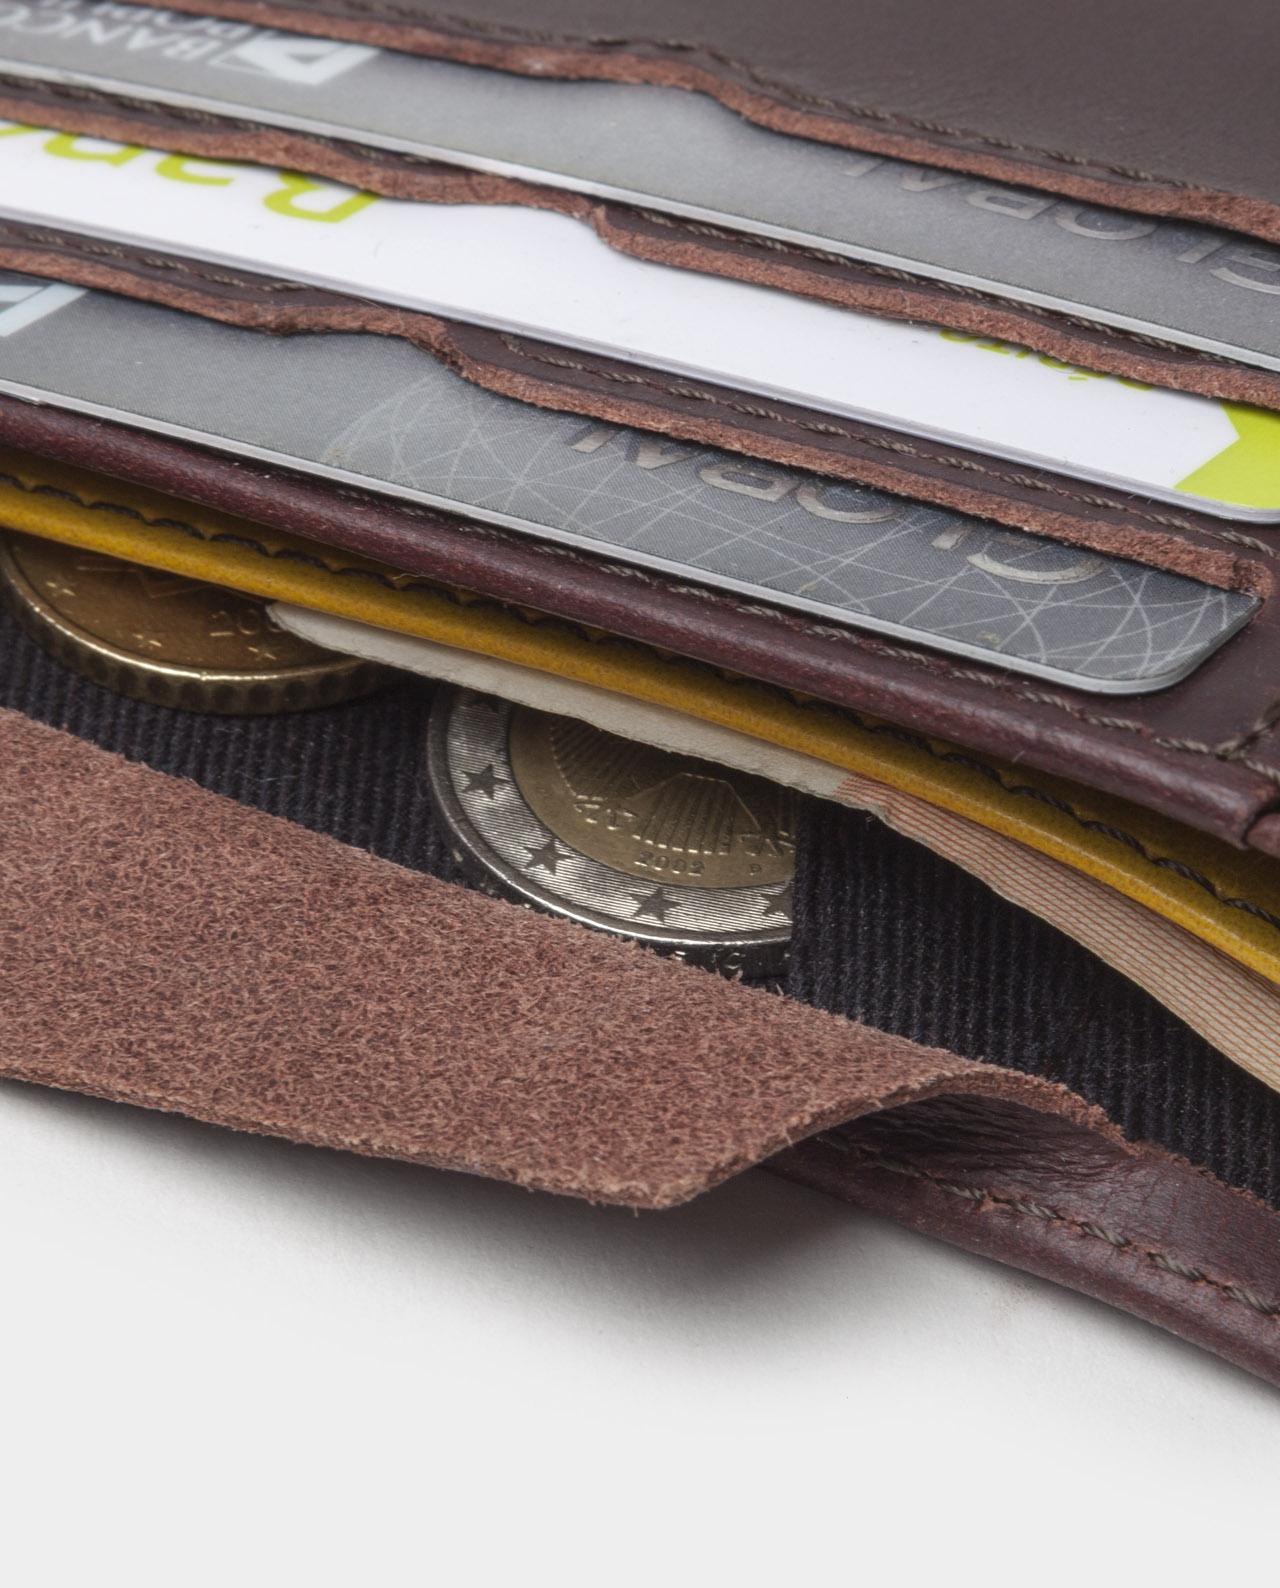 billfold wallet black for coins